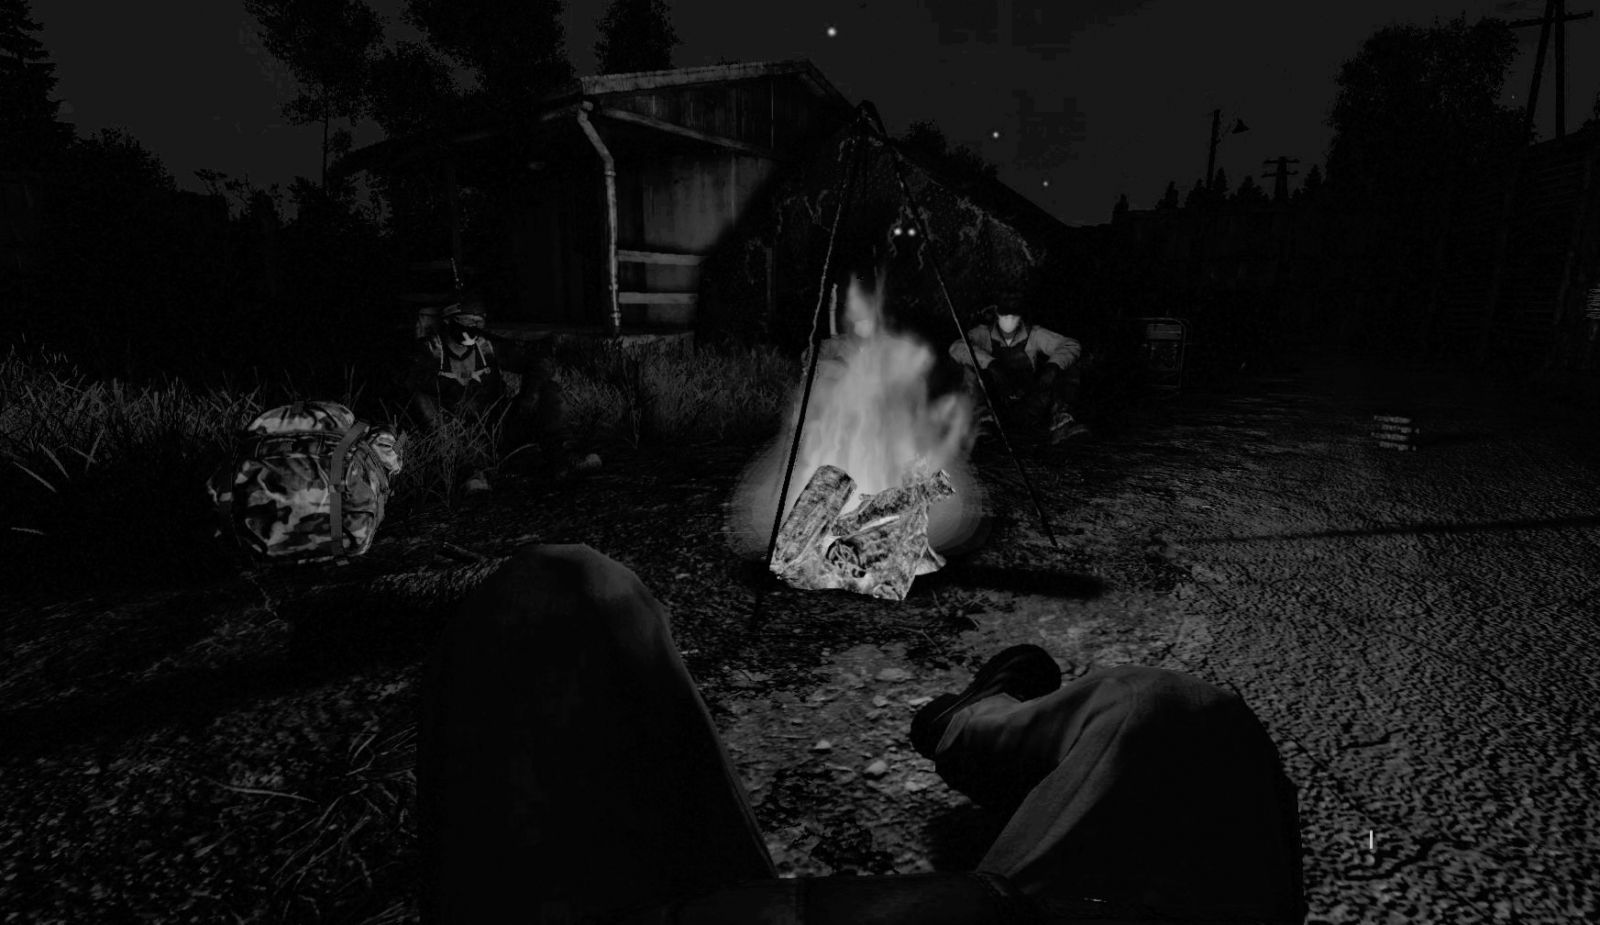 night by the fire.jpg